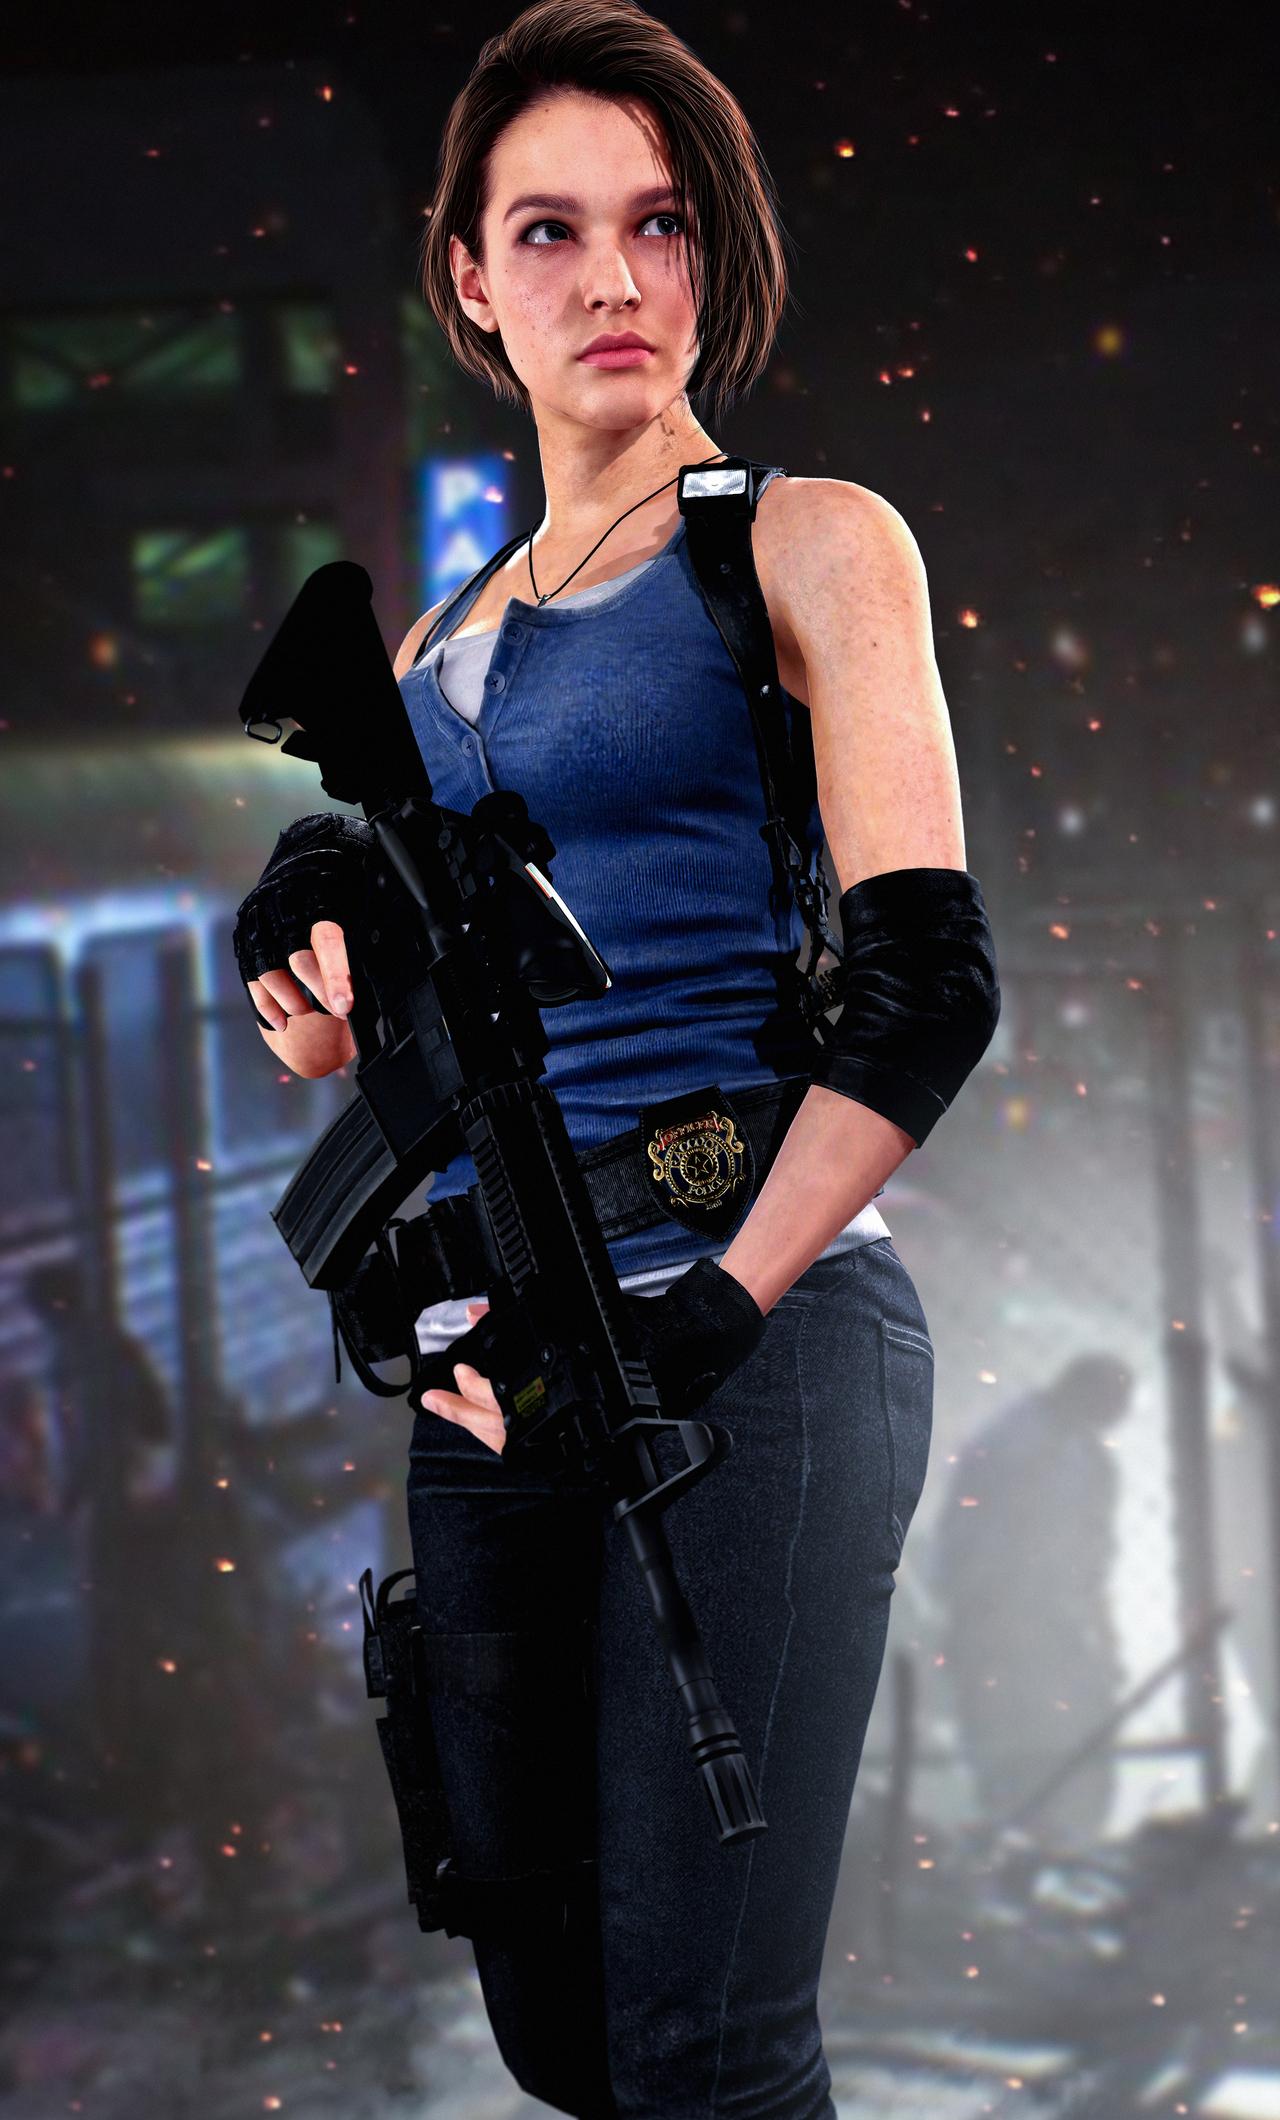 Jill Valentine - Resident Evil 3: Nemesis Cosplay